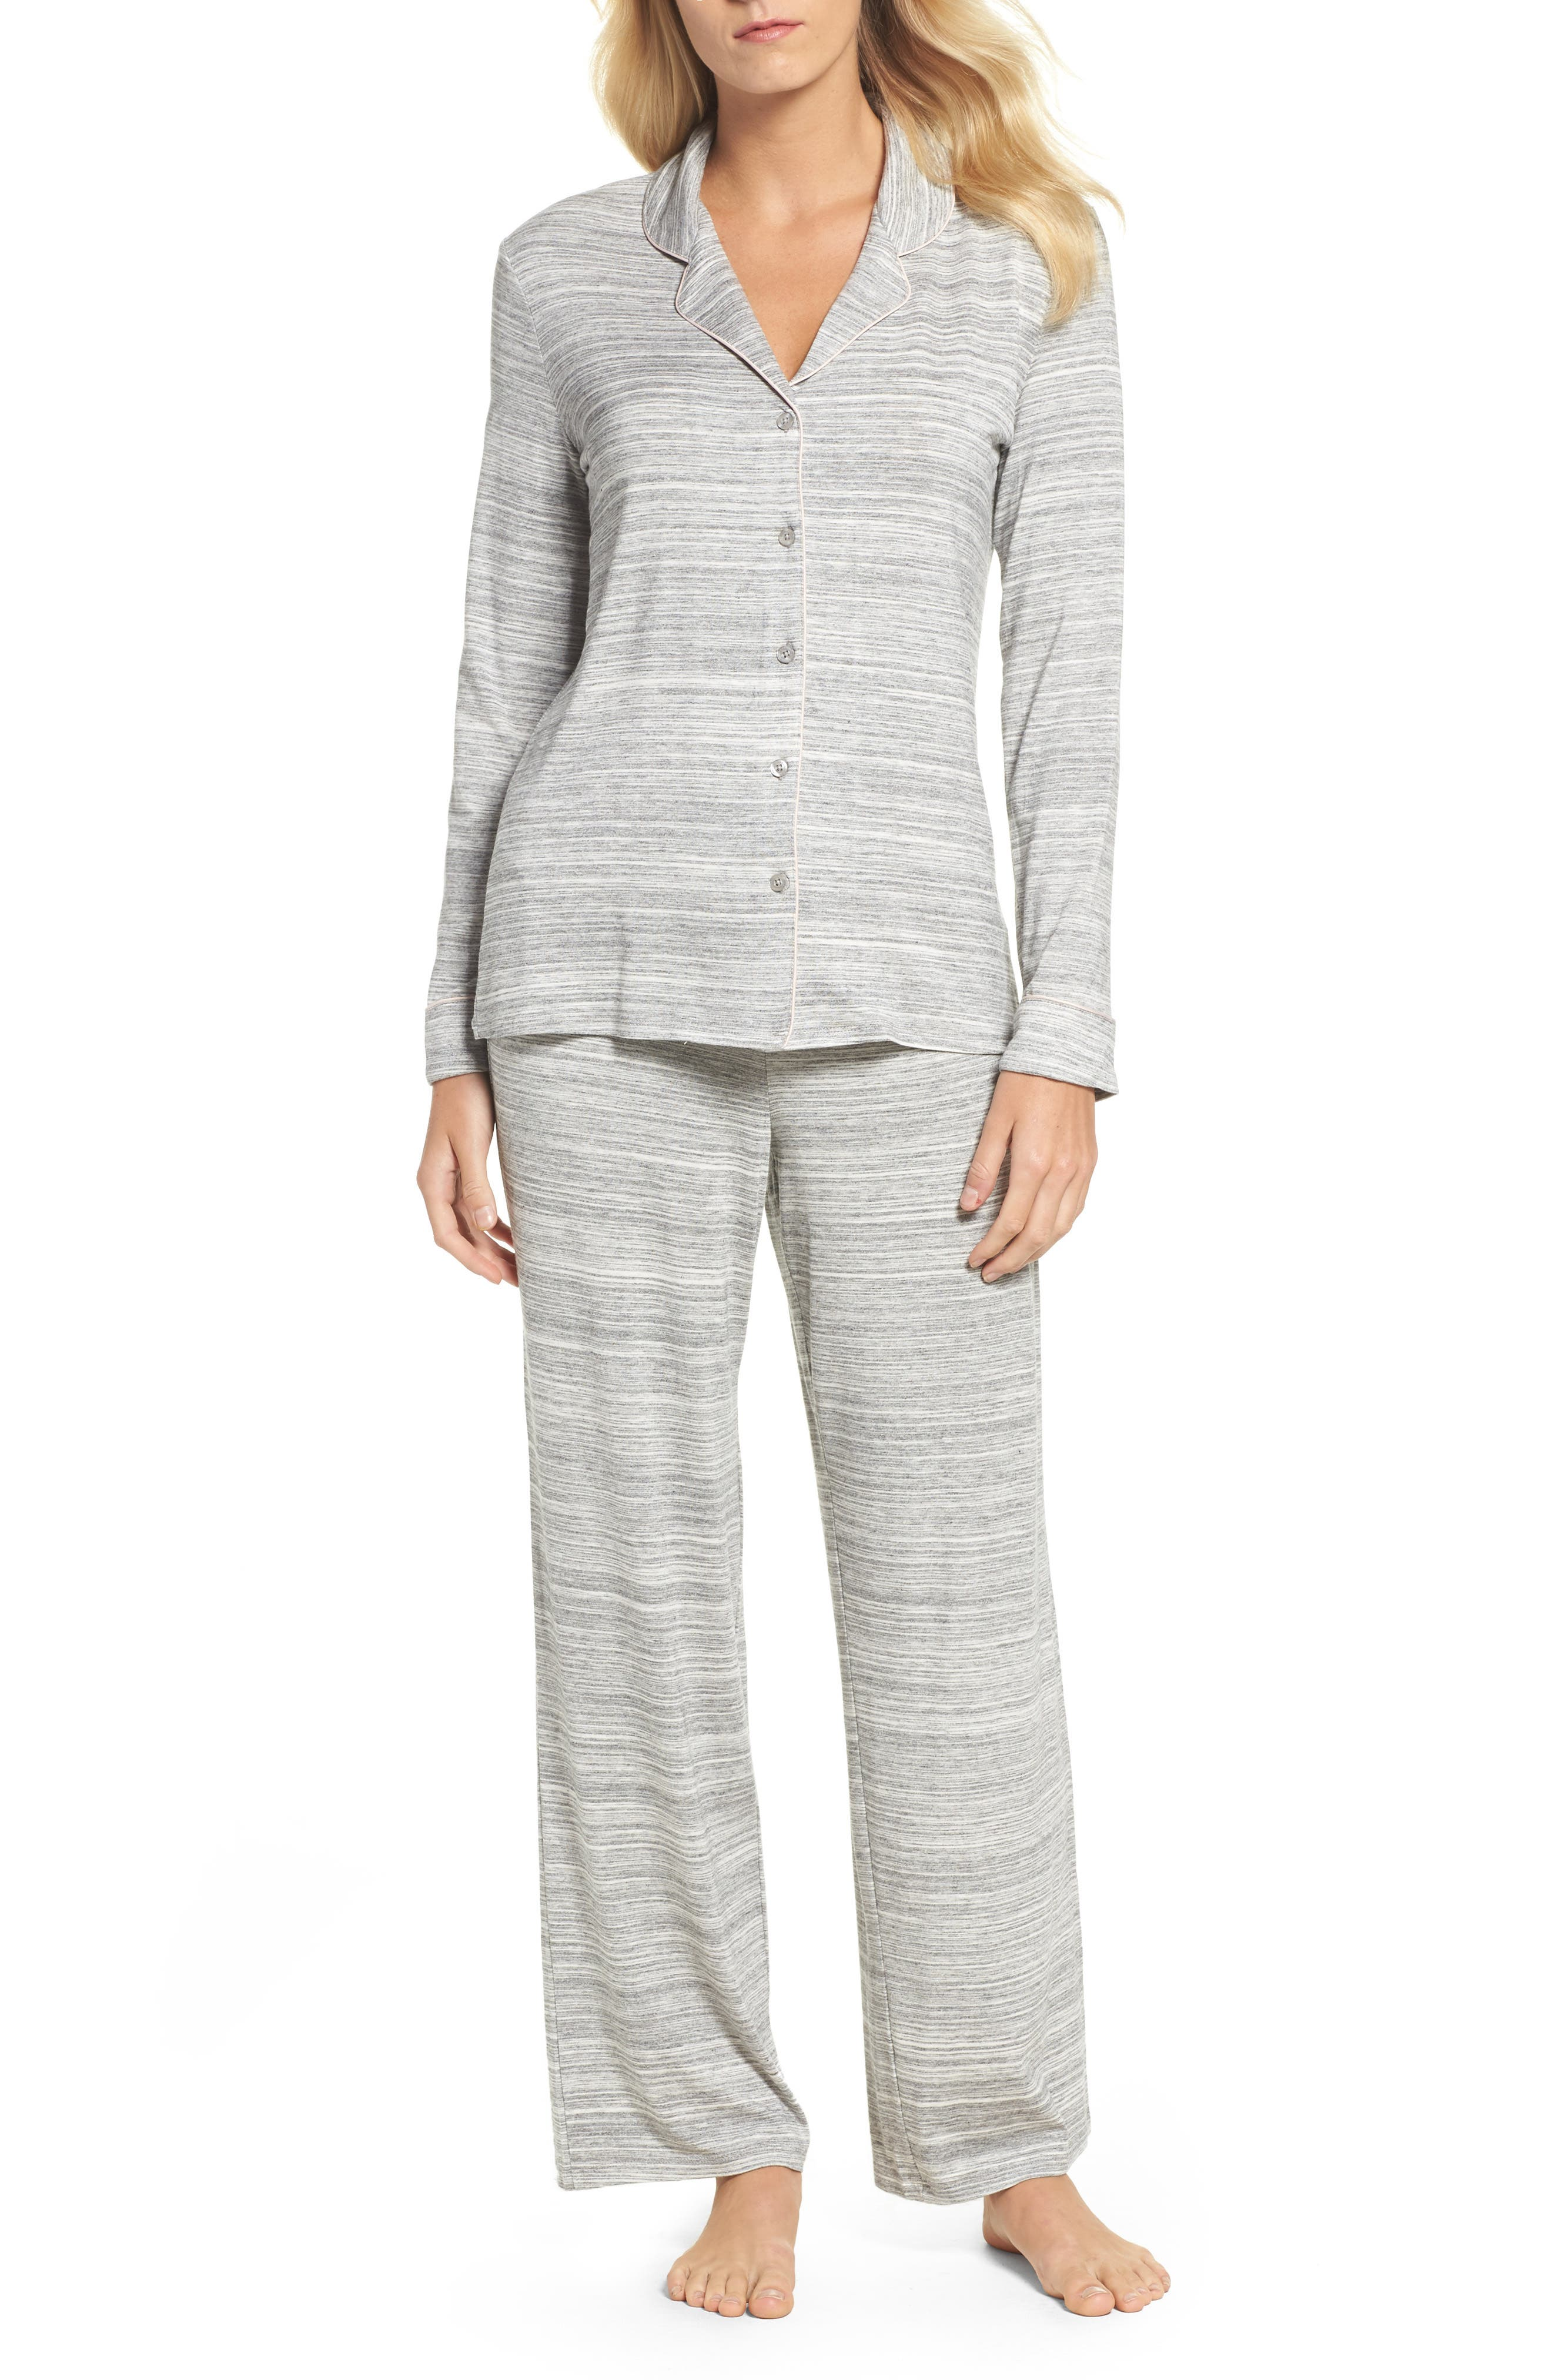 Main Image - Nordstrom Lingerie Moonlight Pajamas